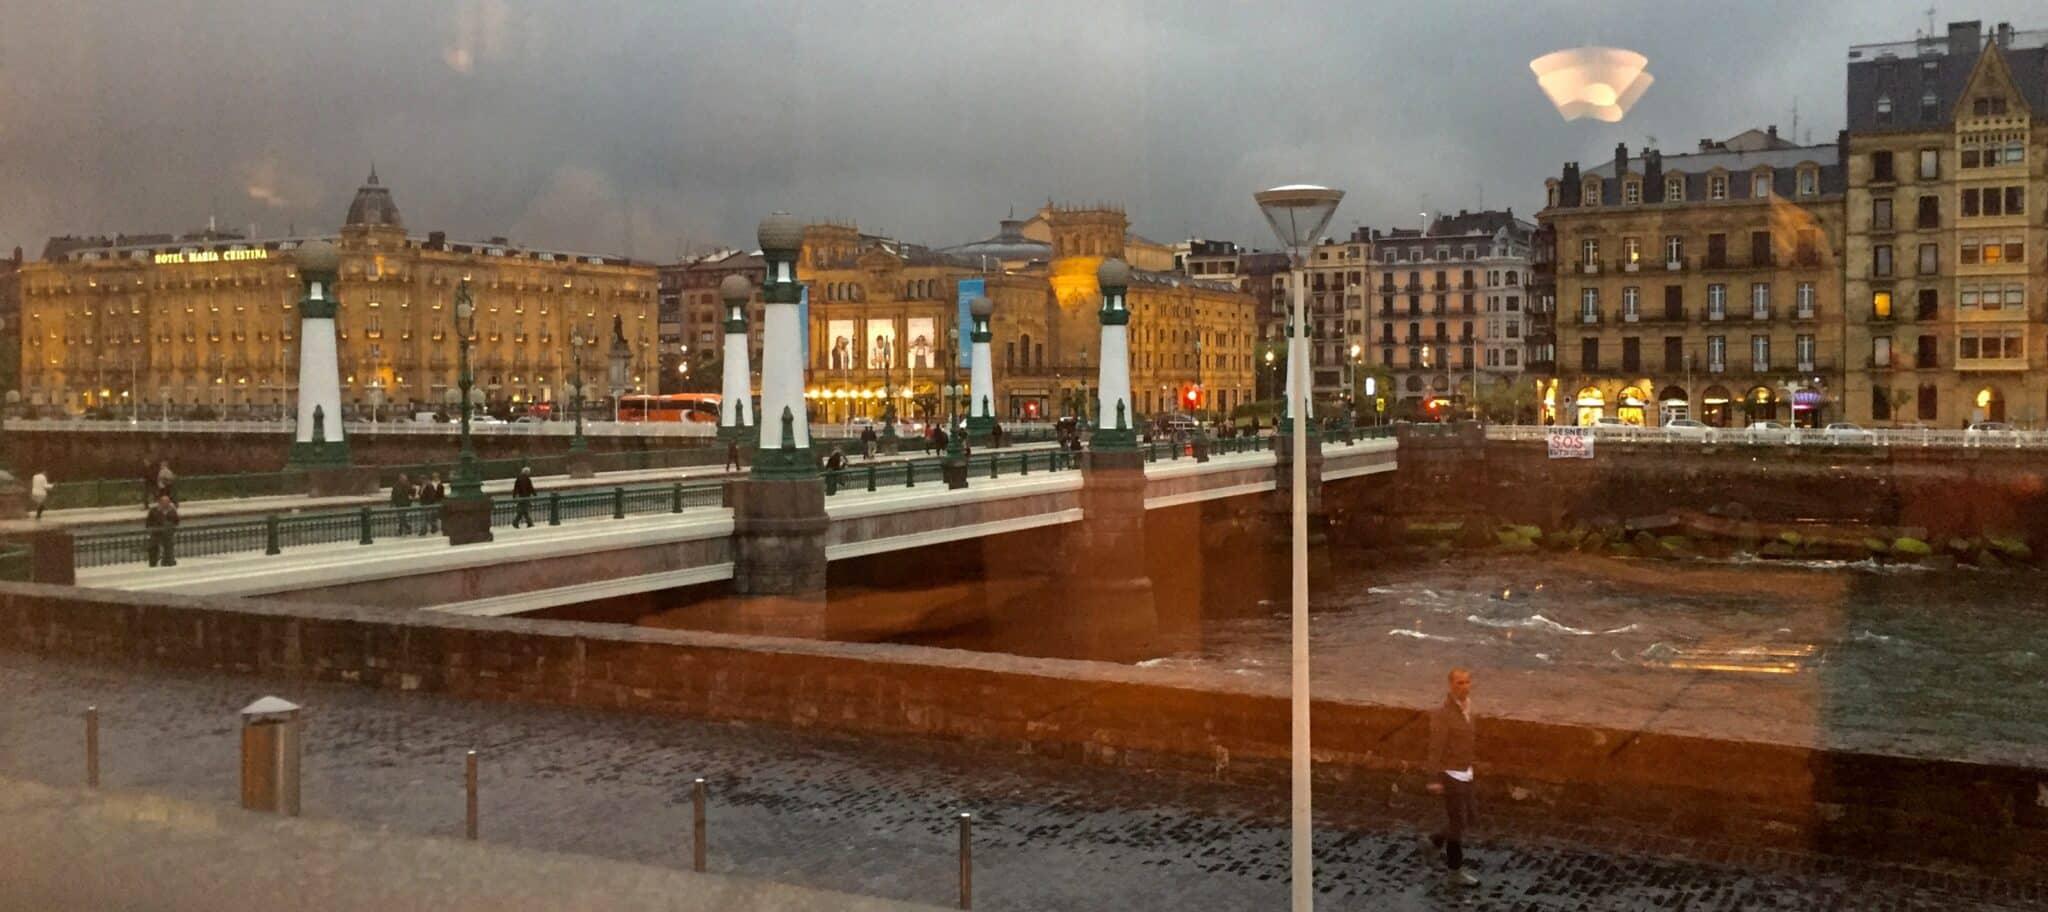 San Sebastián from inside Nie Neu